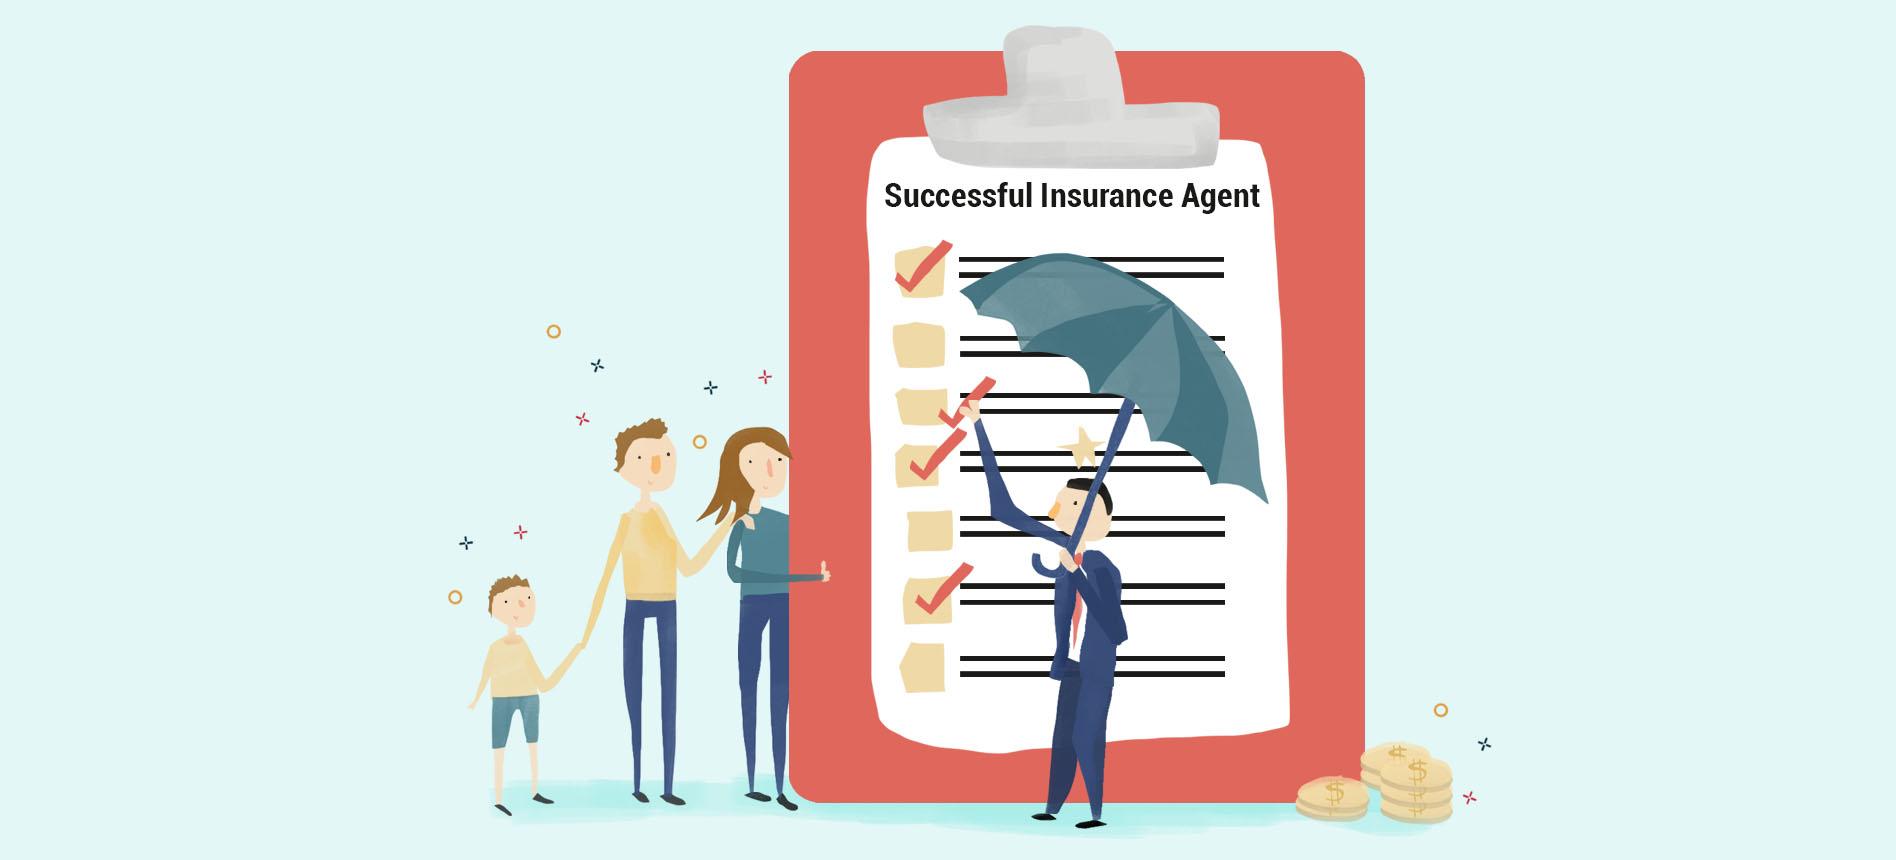 Successful Insurance Agent